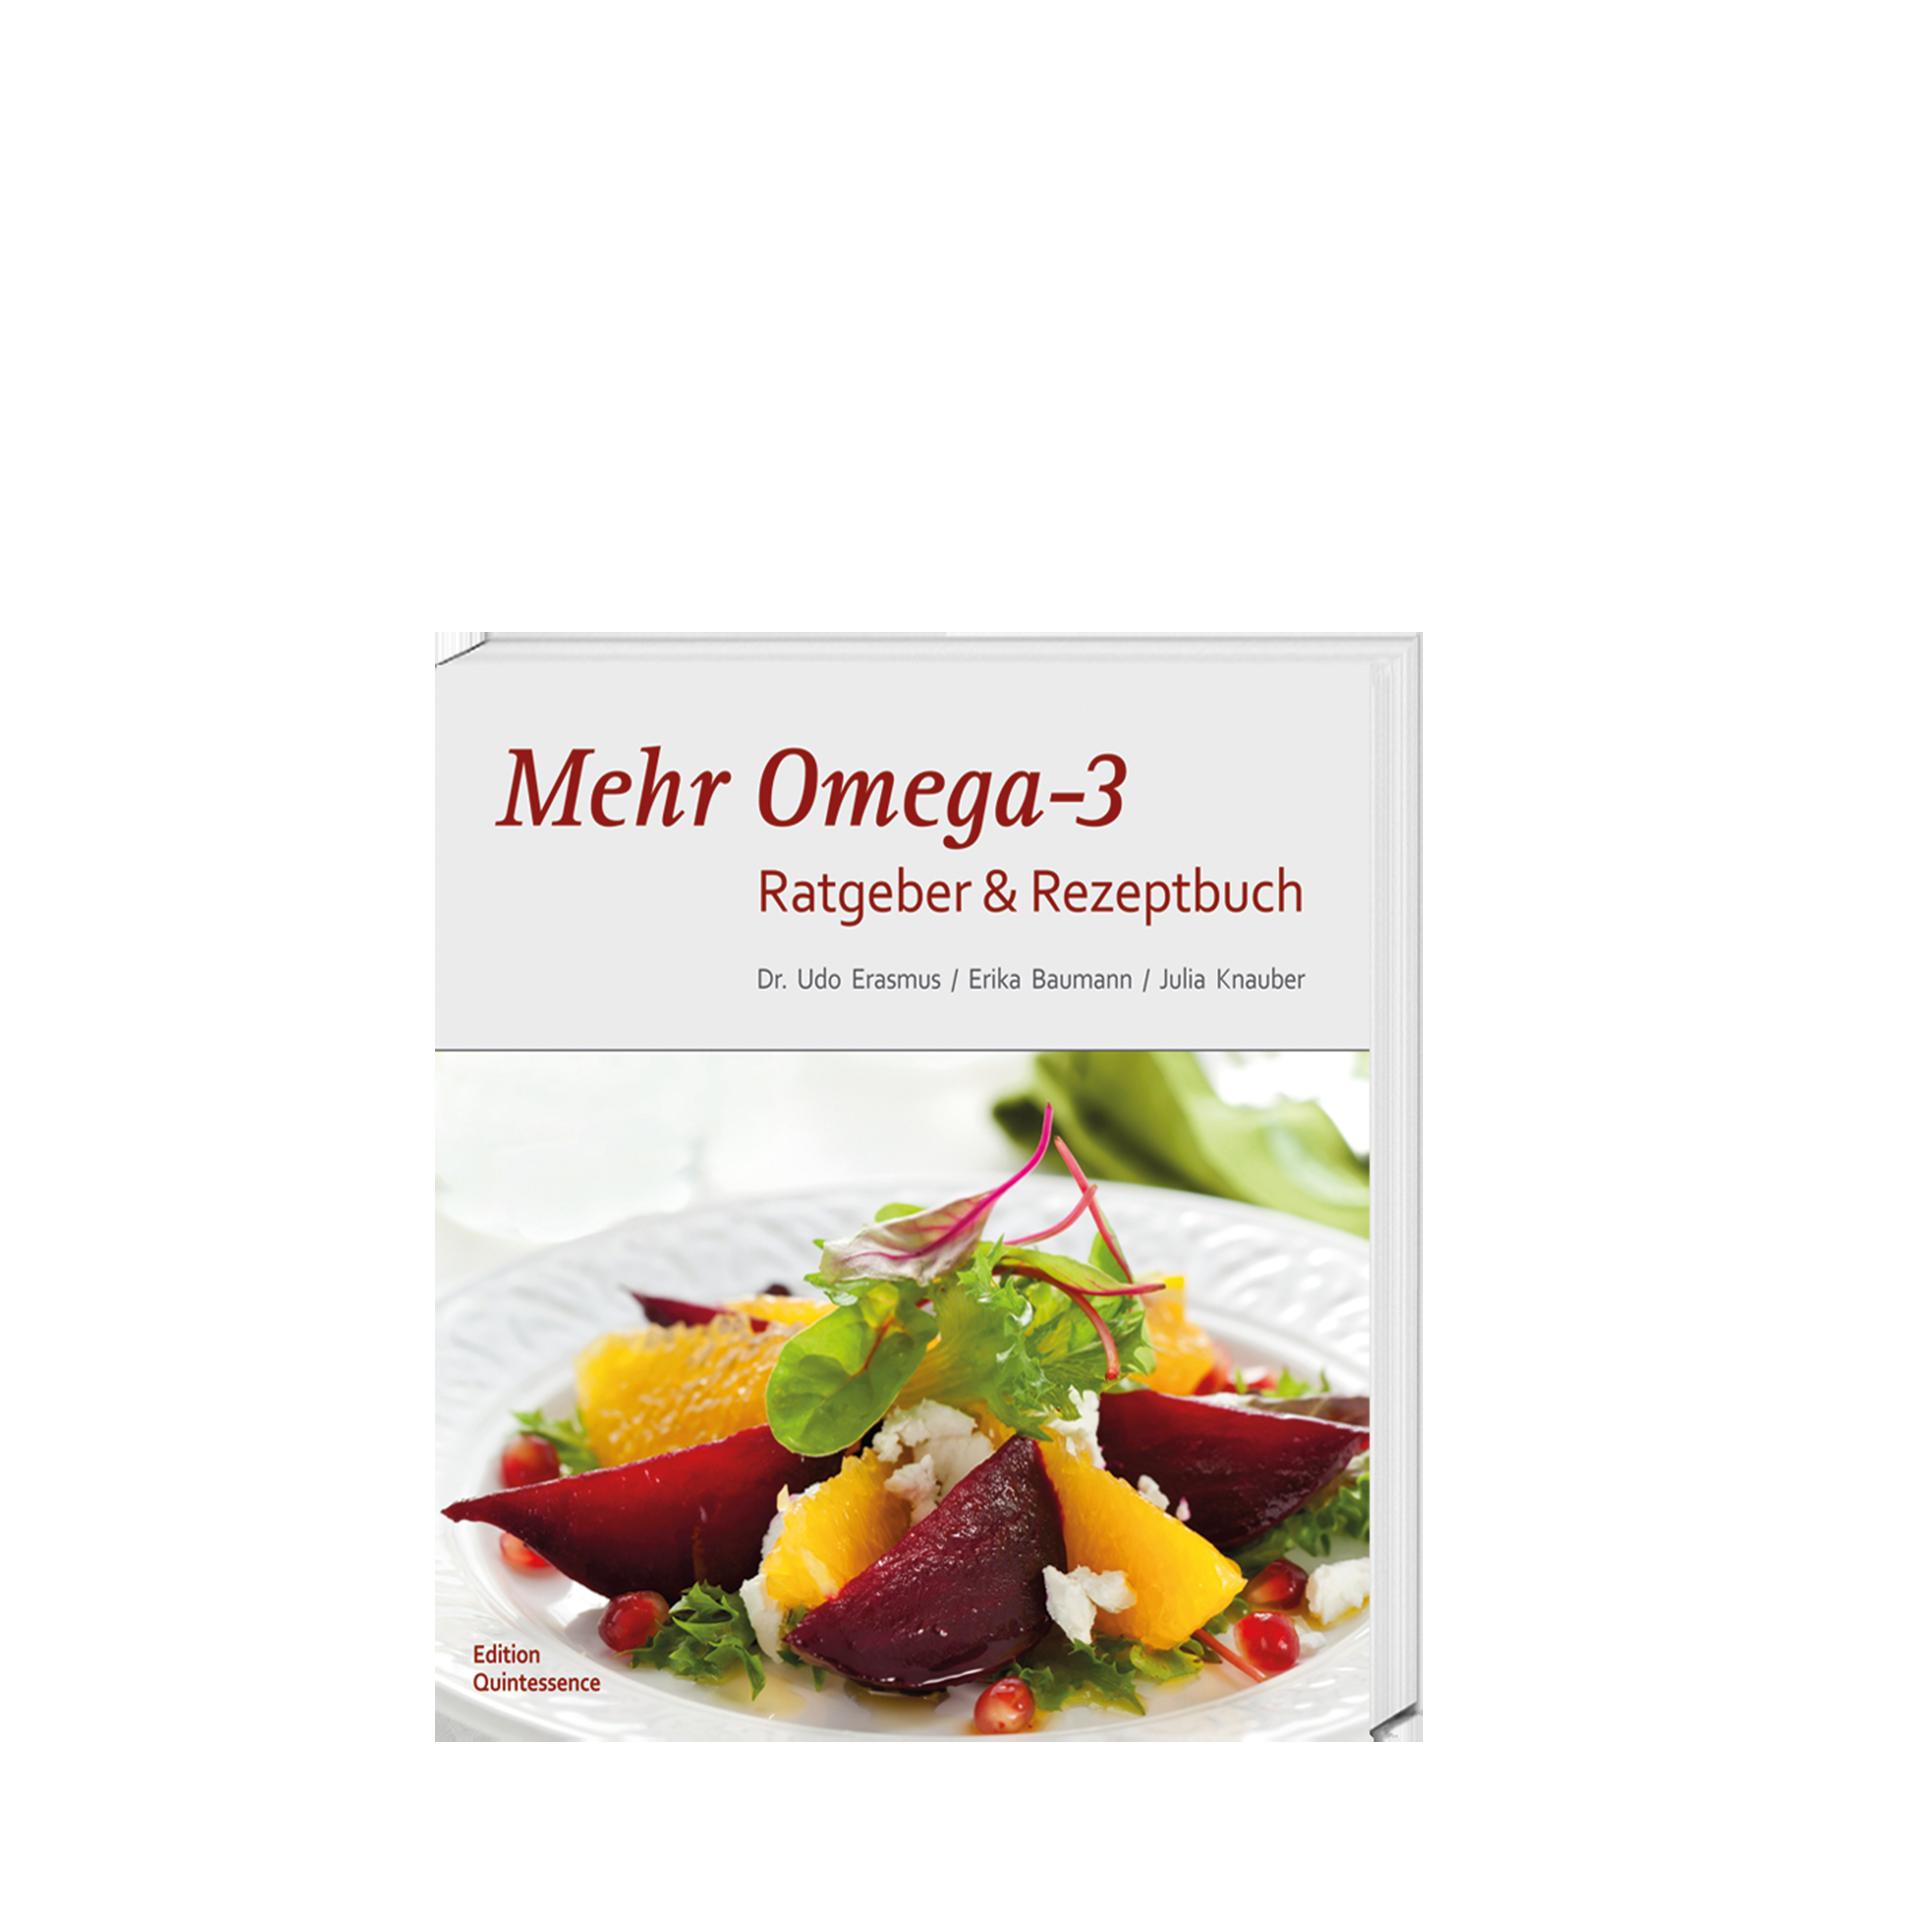 Mehr Omega-3 Ratgeber & Rezeptbuch, 150 Seiten